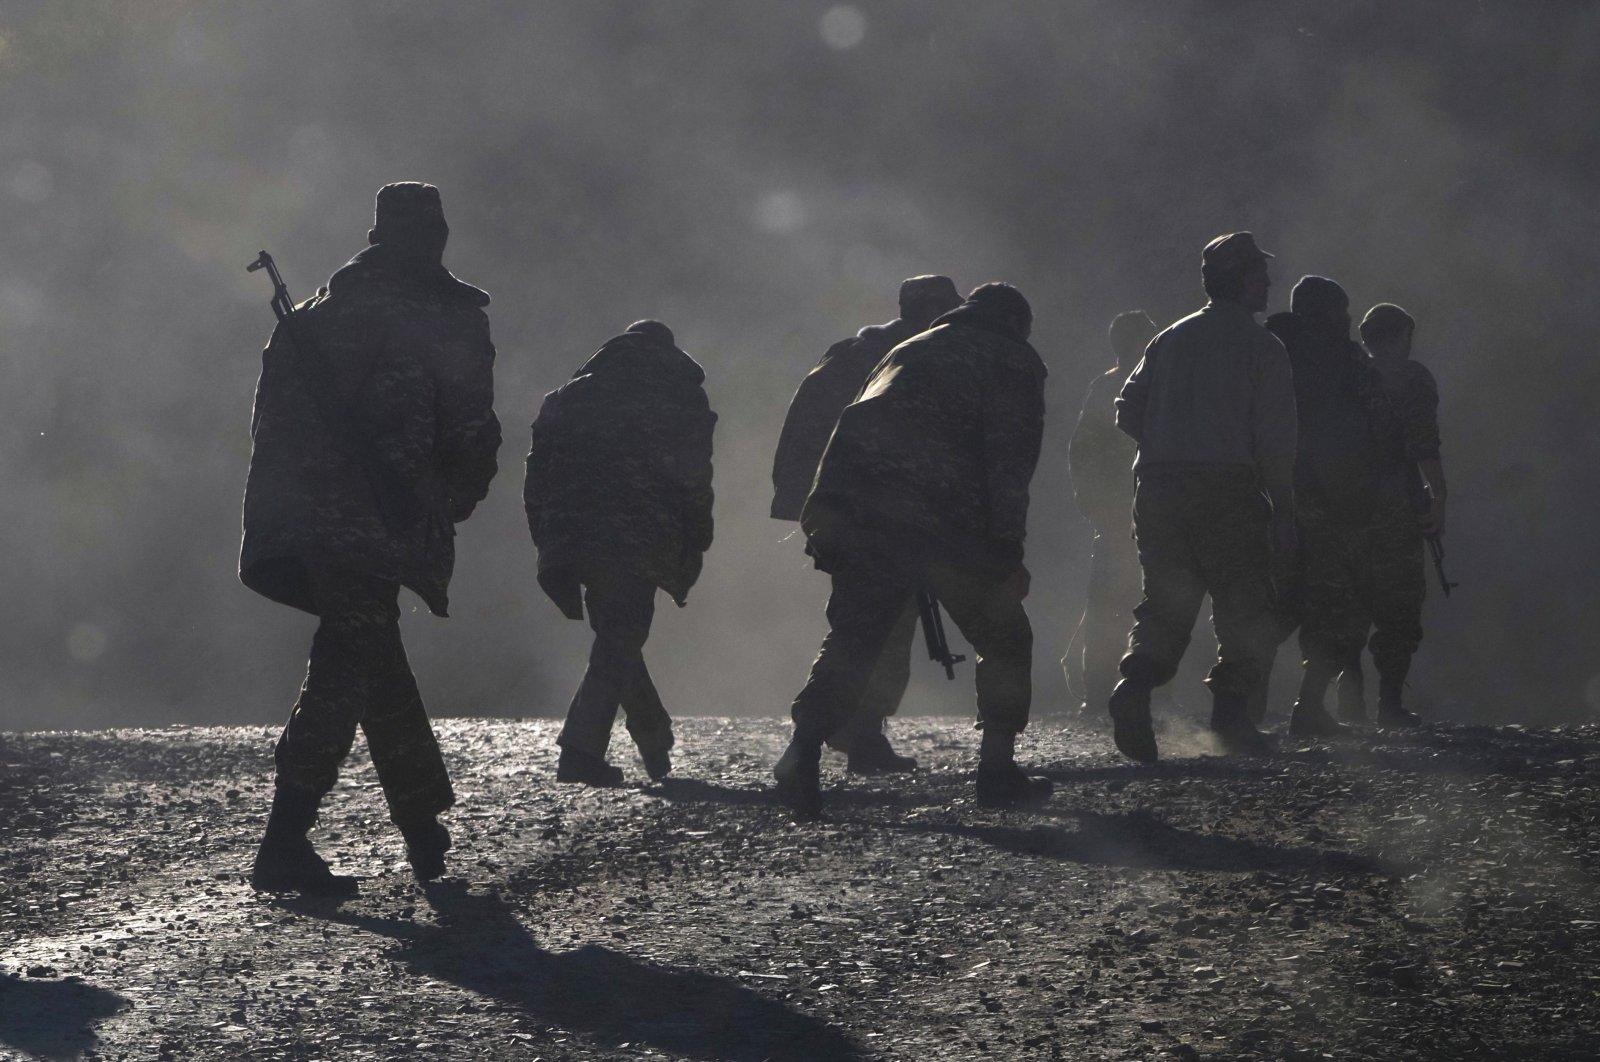 Armenian soldiers walk along the road near the border between Nagorno-Karabakh and Armenia, Nov. 8, 2020. (AP Photo)